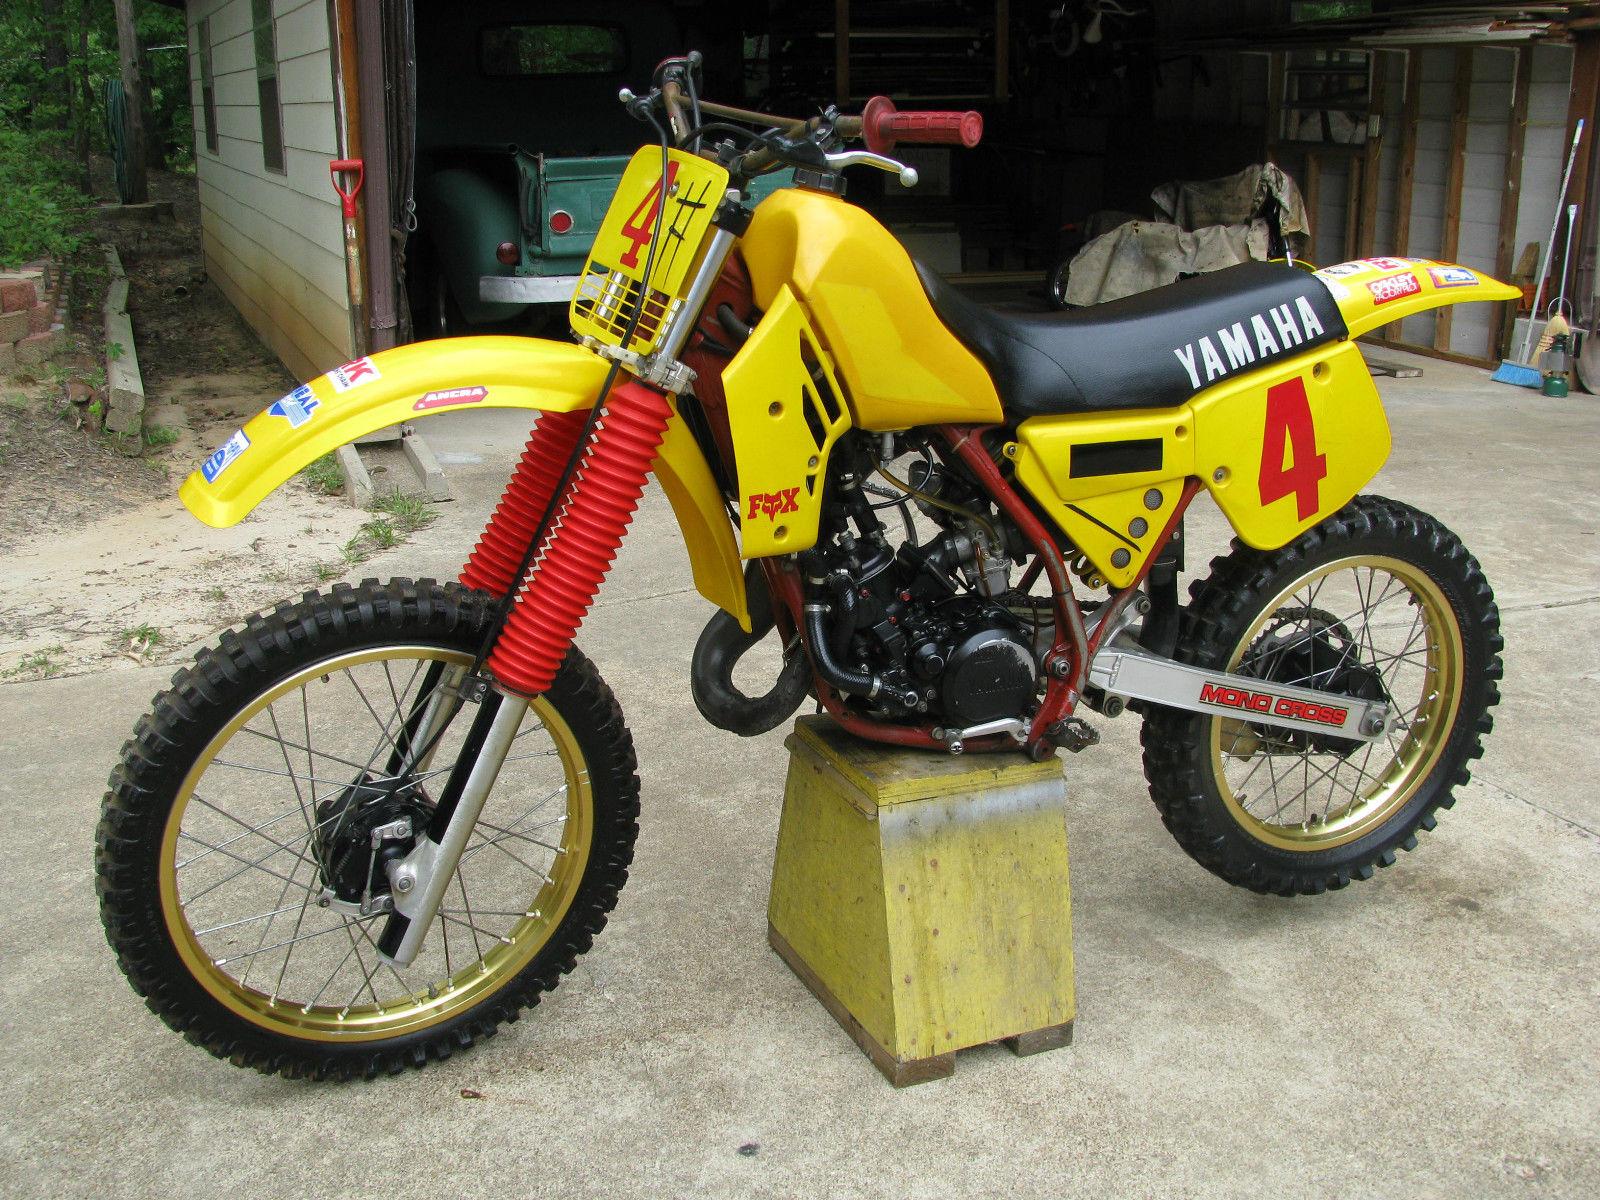 Vintage 1984 Yamaha Yz 125 Motocross Motorcycle